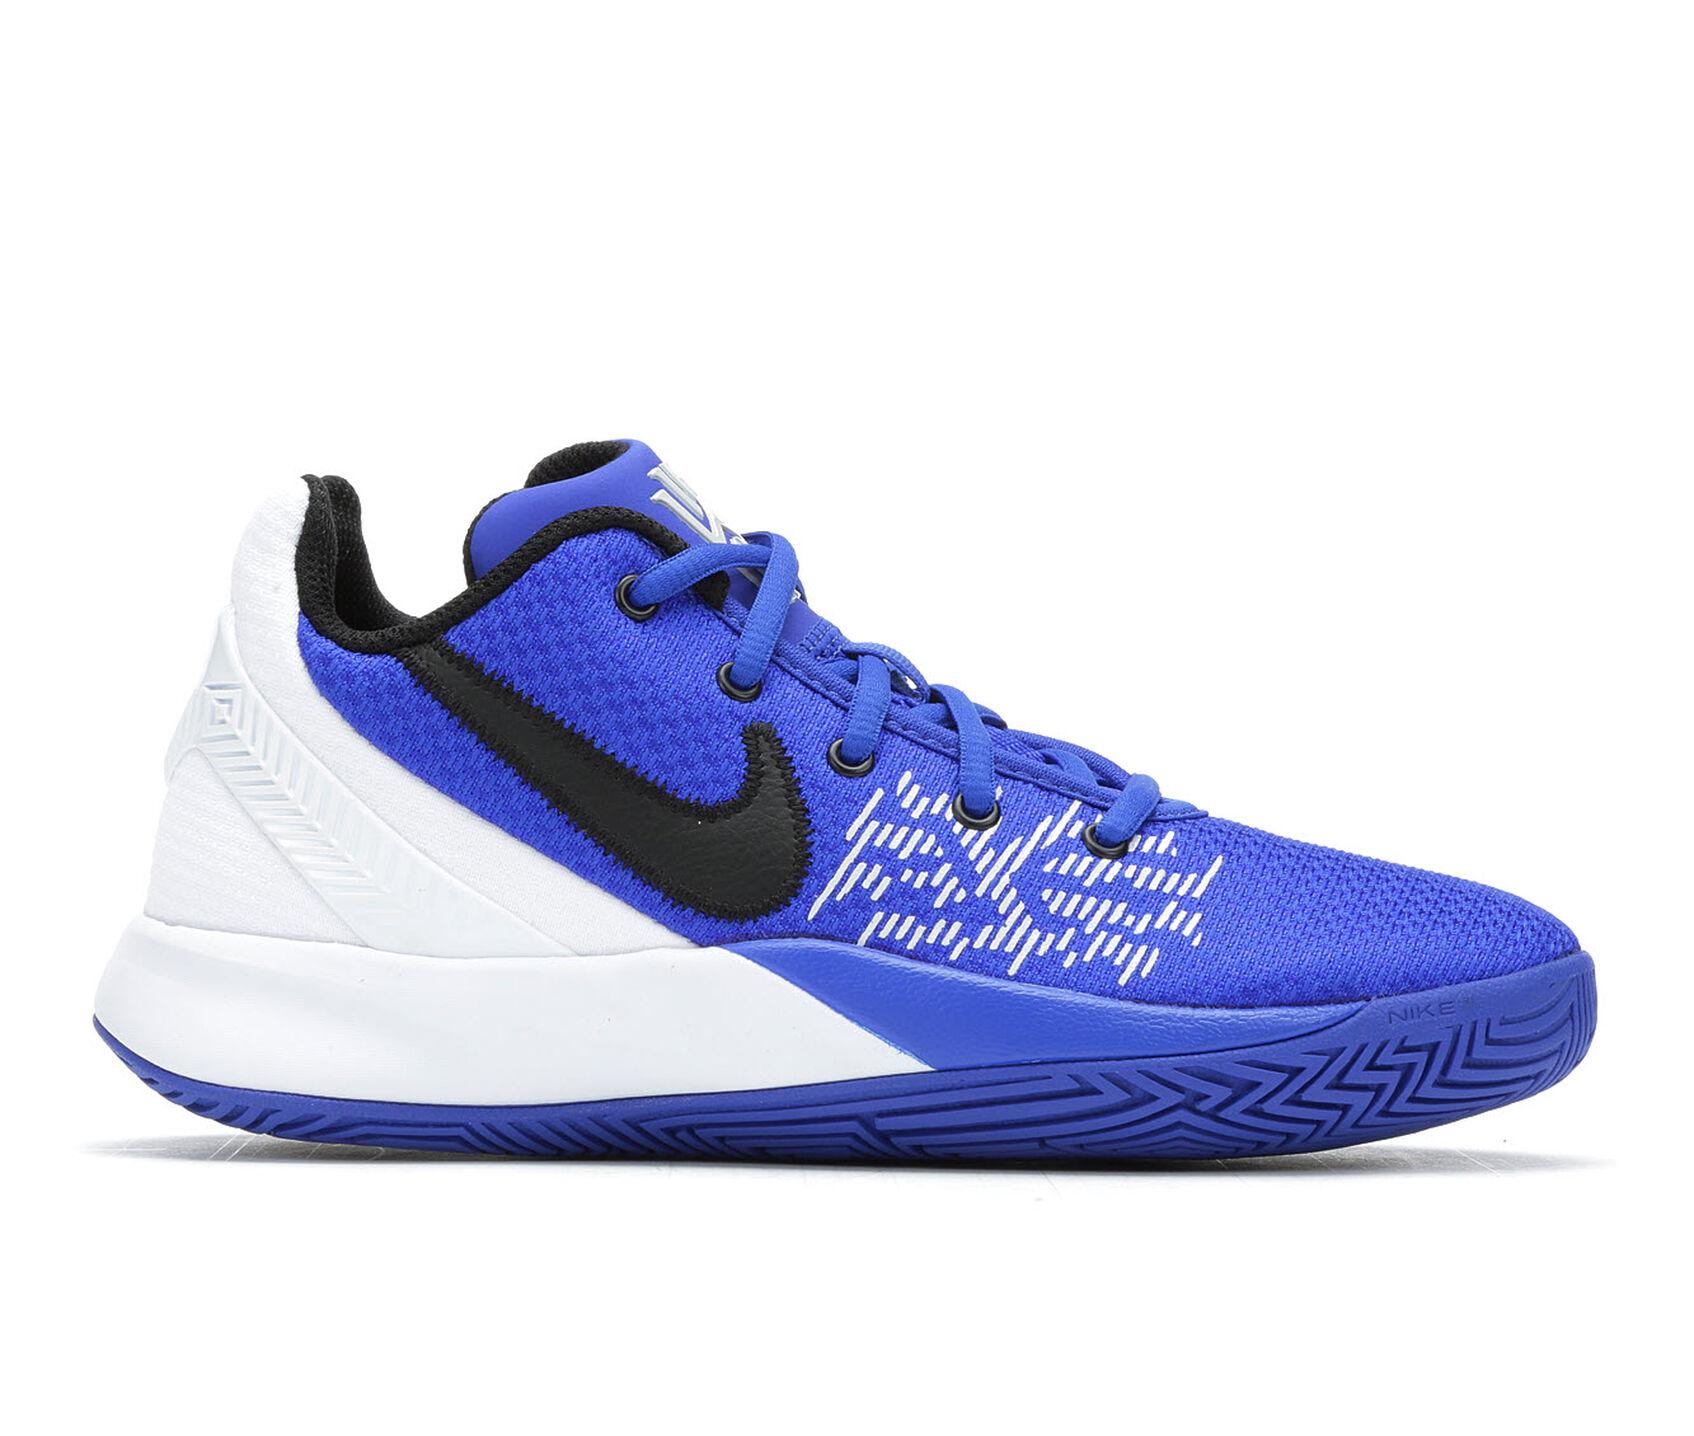 cheaper e86c5 b2a3c Boys' Nike Big Kid Kyrie Flytrap II Basketball Shoes